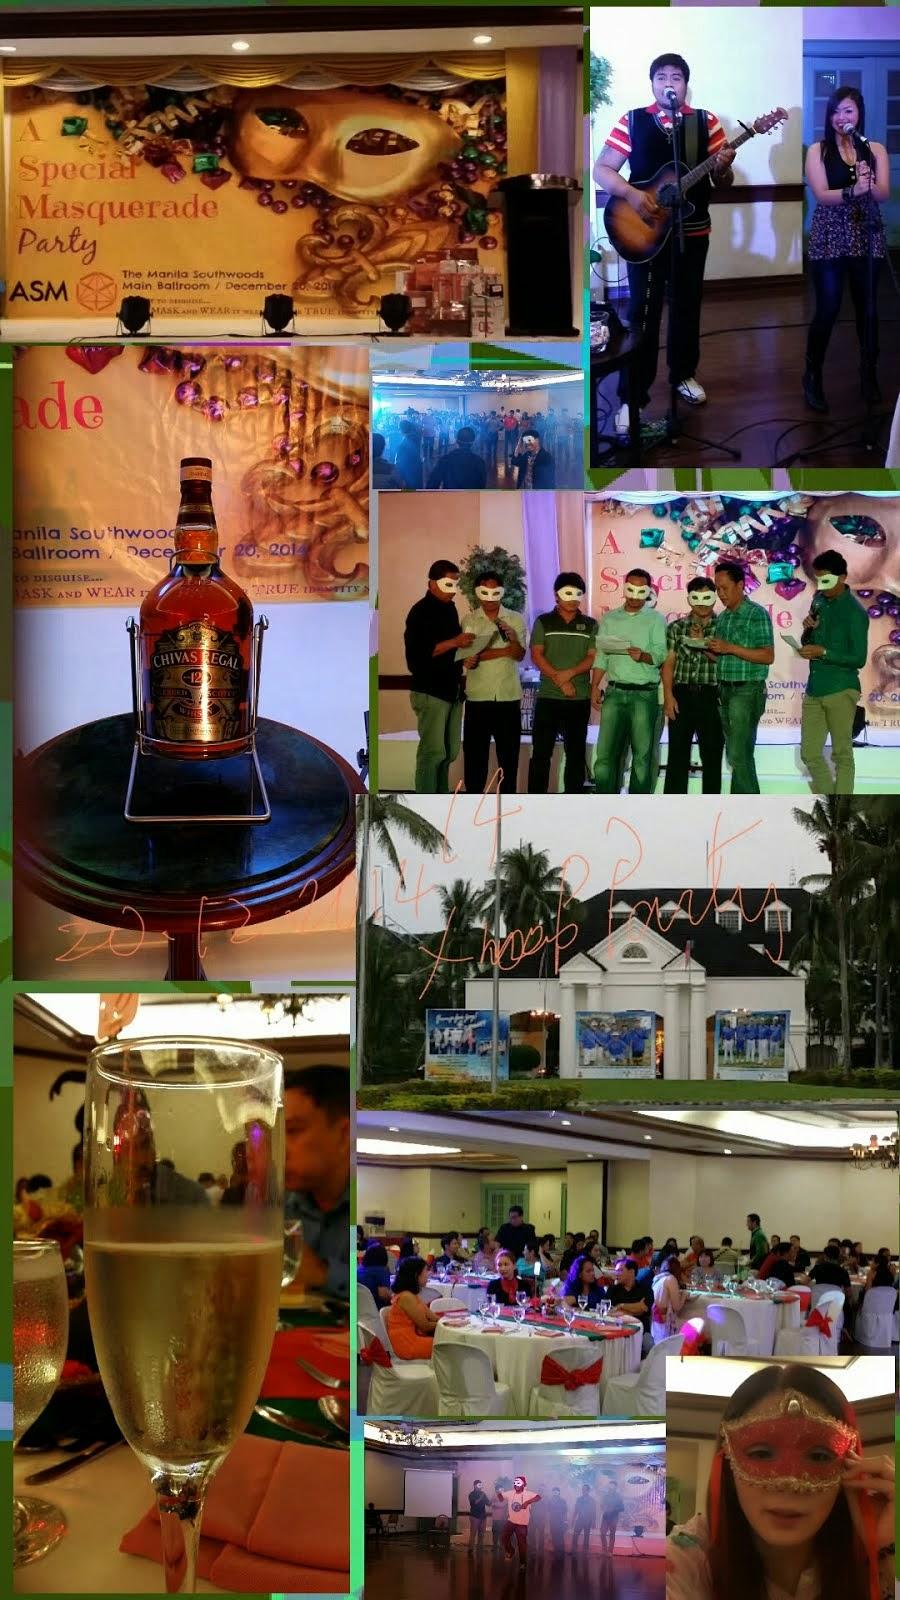 My Xmas Party 2014